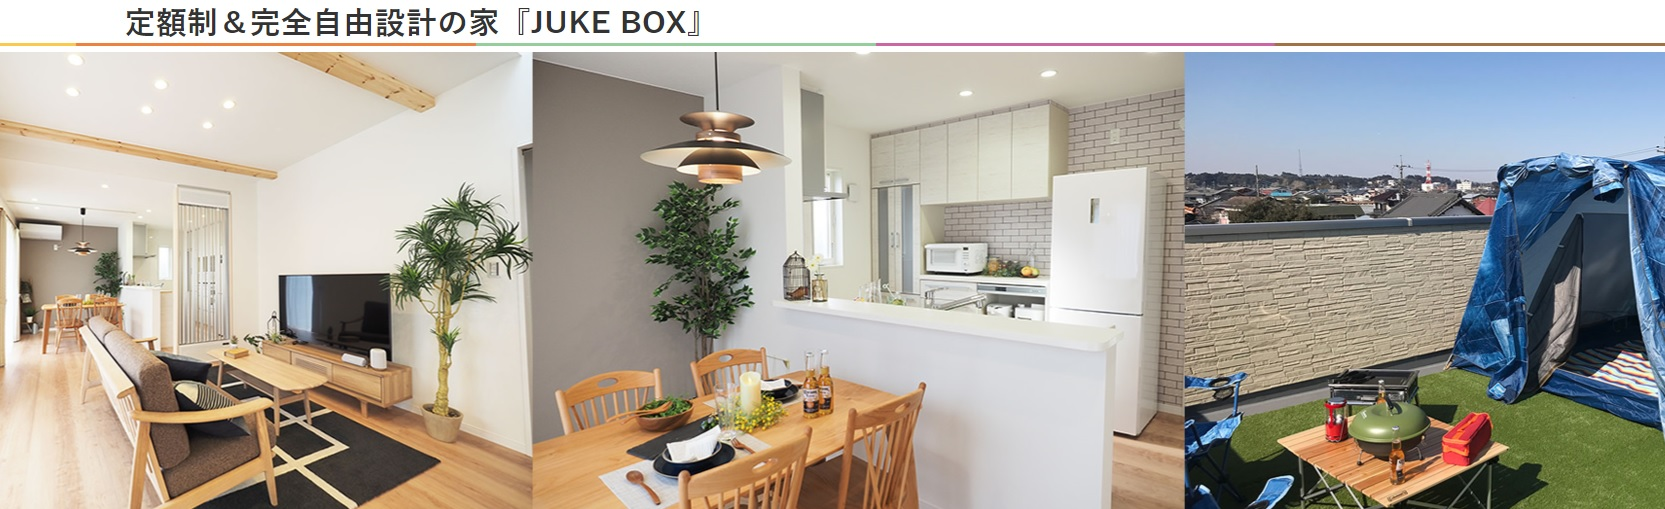 定額制&完全自由設計の家『JUKE BOX』